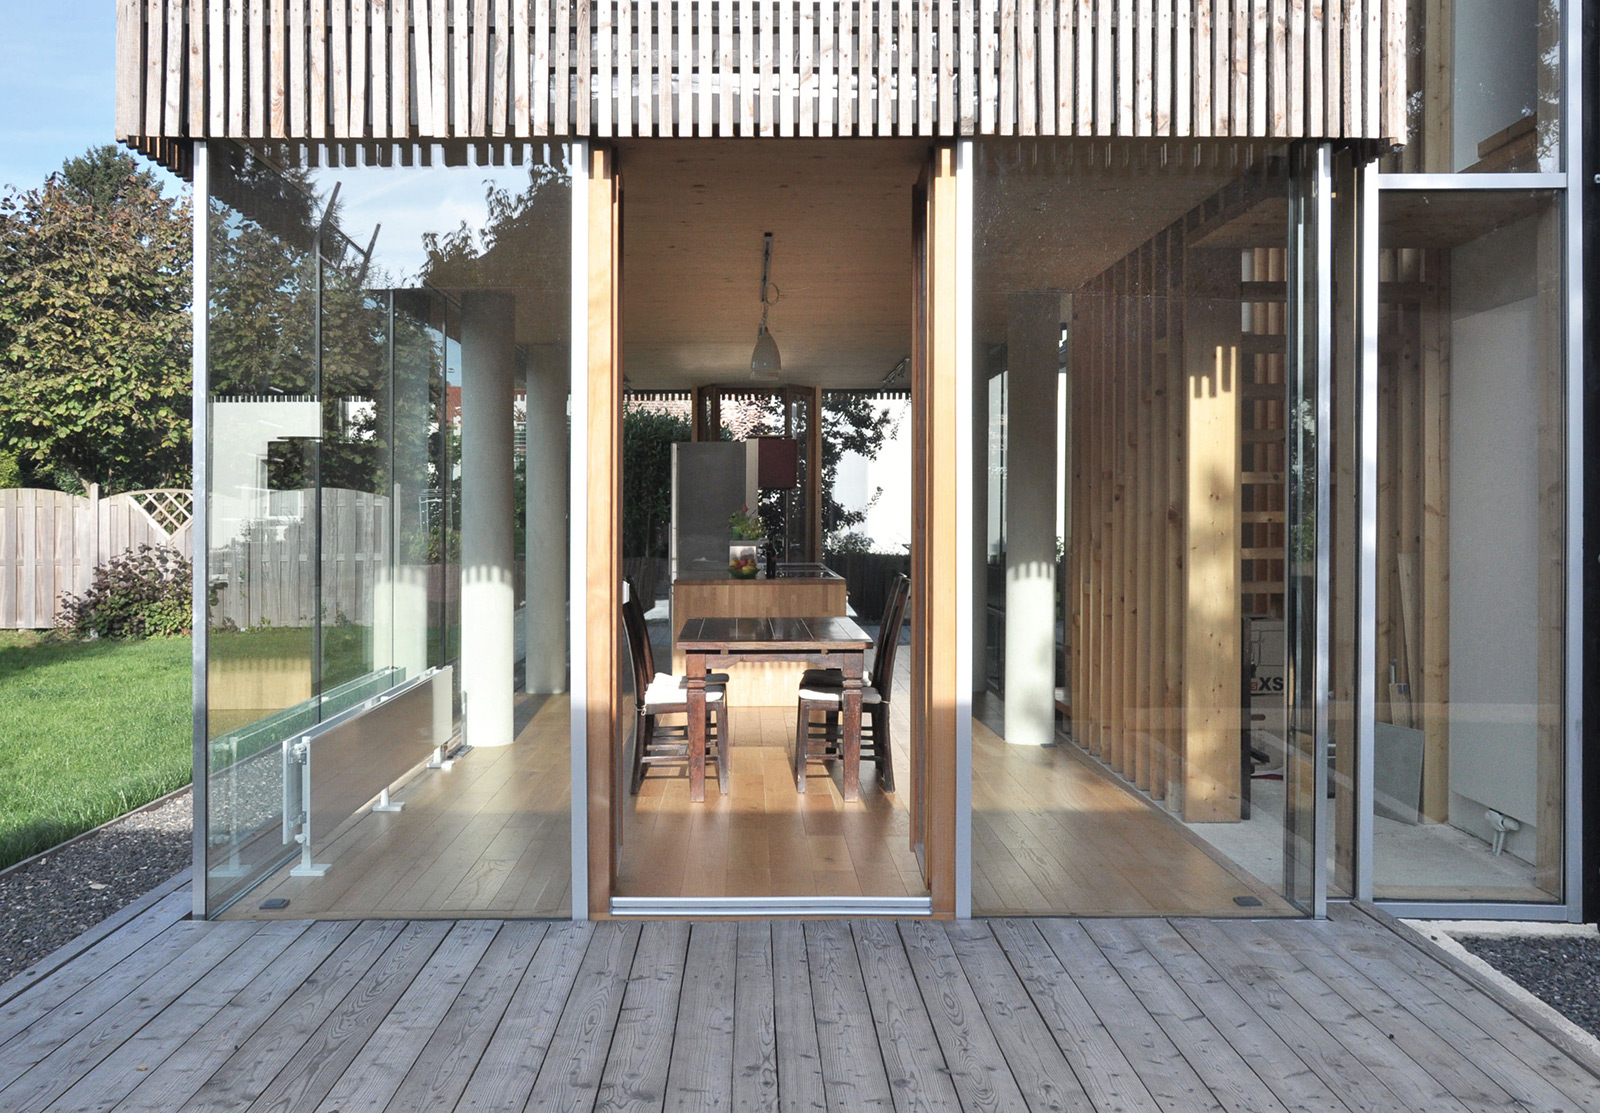 haus es s aachen richterich holzhueter architektur. Black Bedroom Furniture Sets. Home Design Ideas